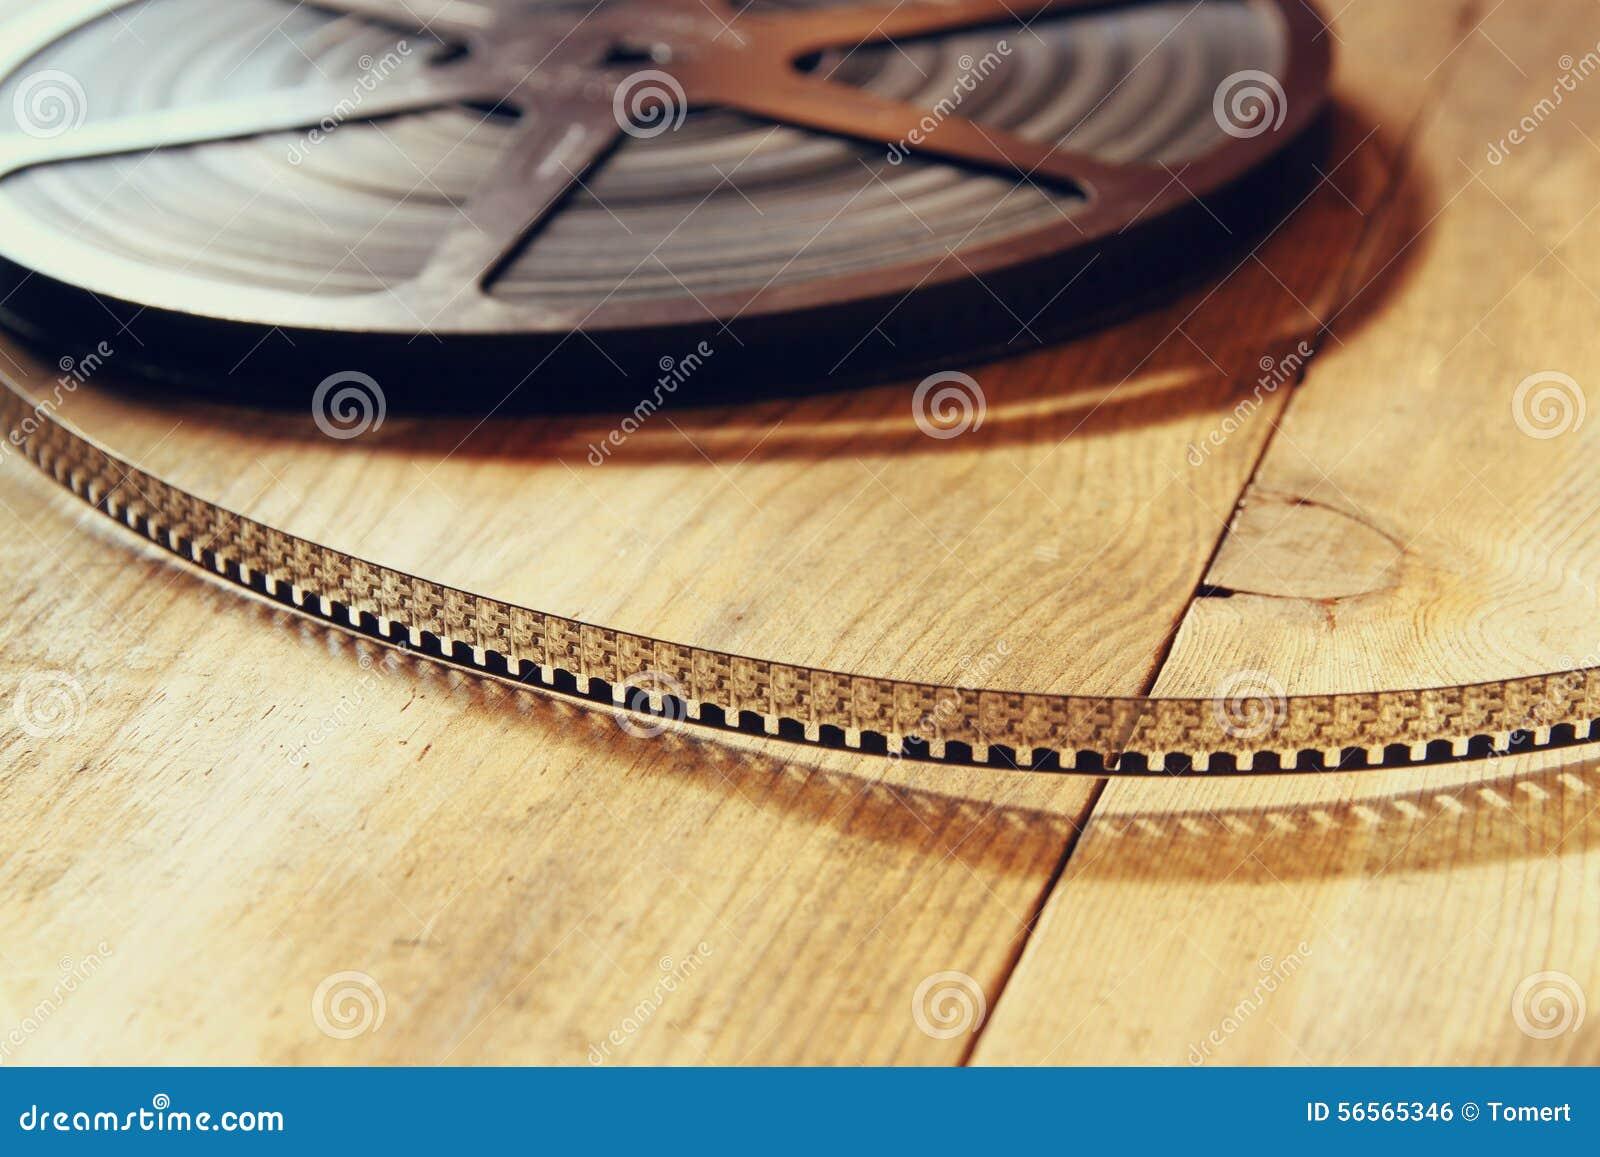 Download Τοπ εικόνα άποψης του παλαιού εξελίκτρου κινηματογράφων 8 χιλ. πέρα από το ξύλινο υπόβαθρο Στοκ Εικόνες - εικόνα από κινηματογράφος, εμφανίστε: 56565346